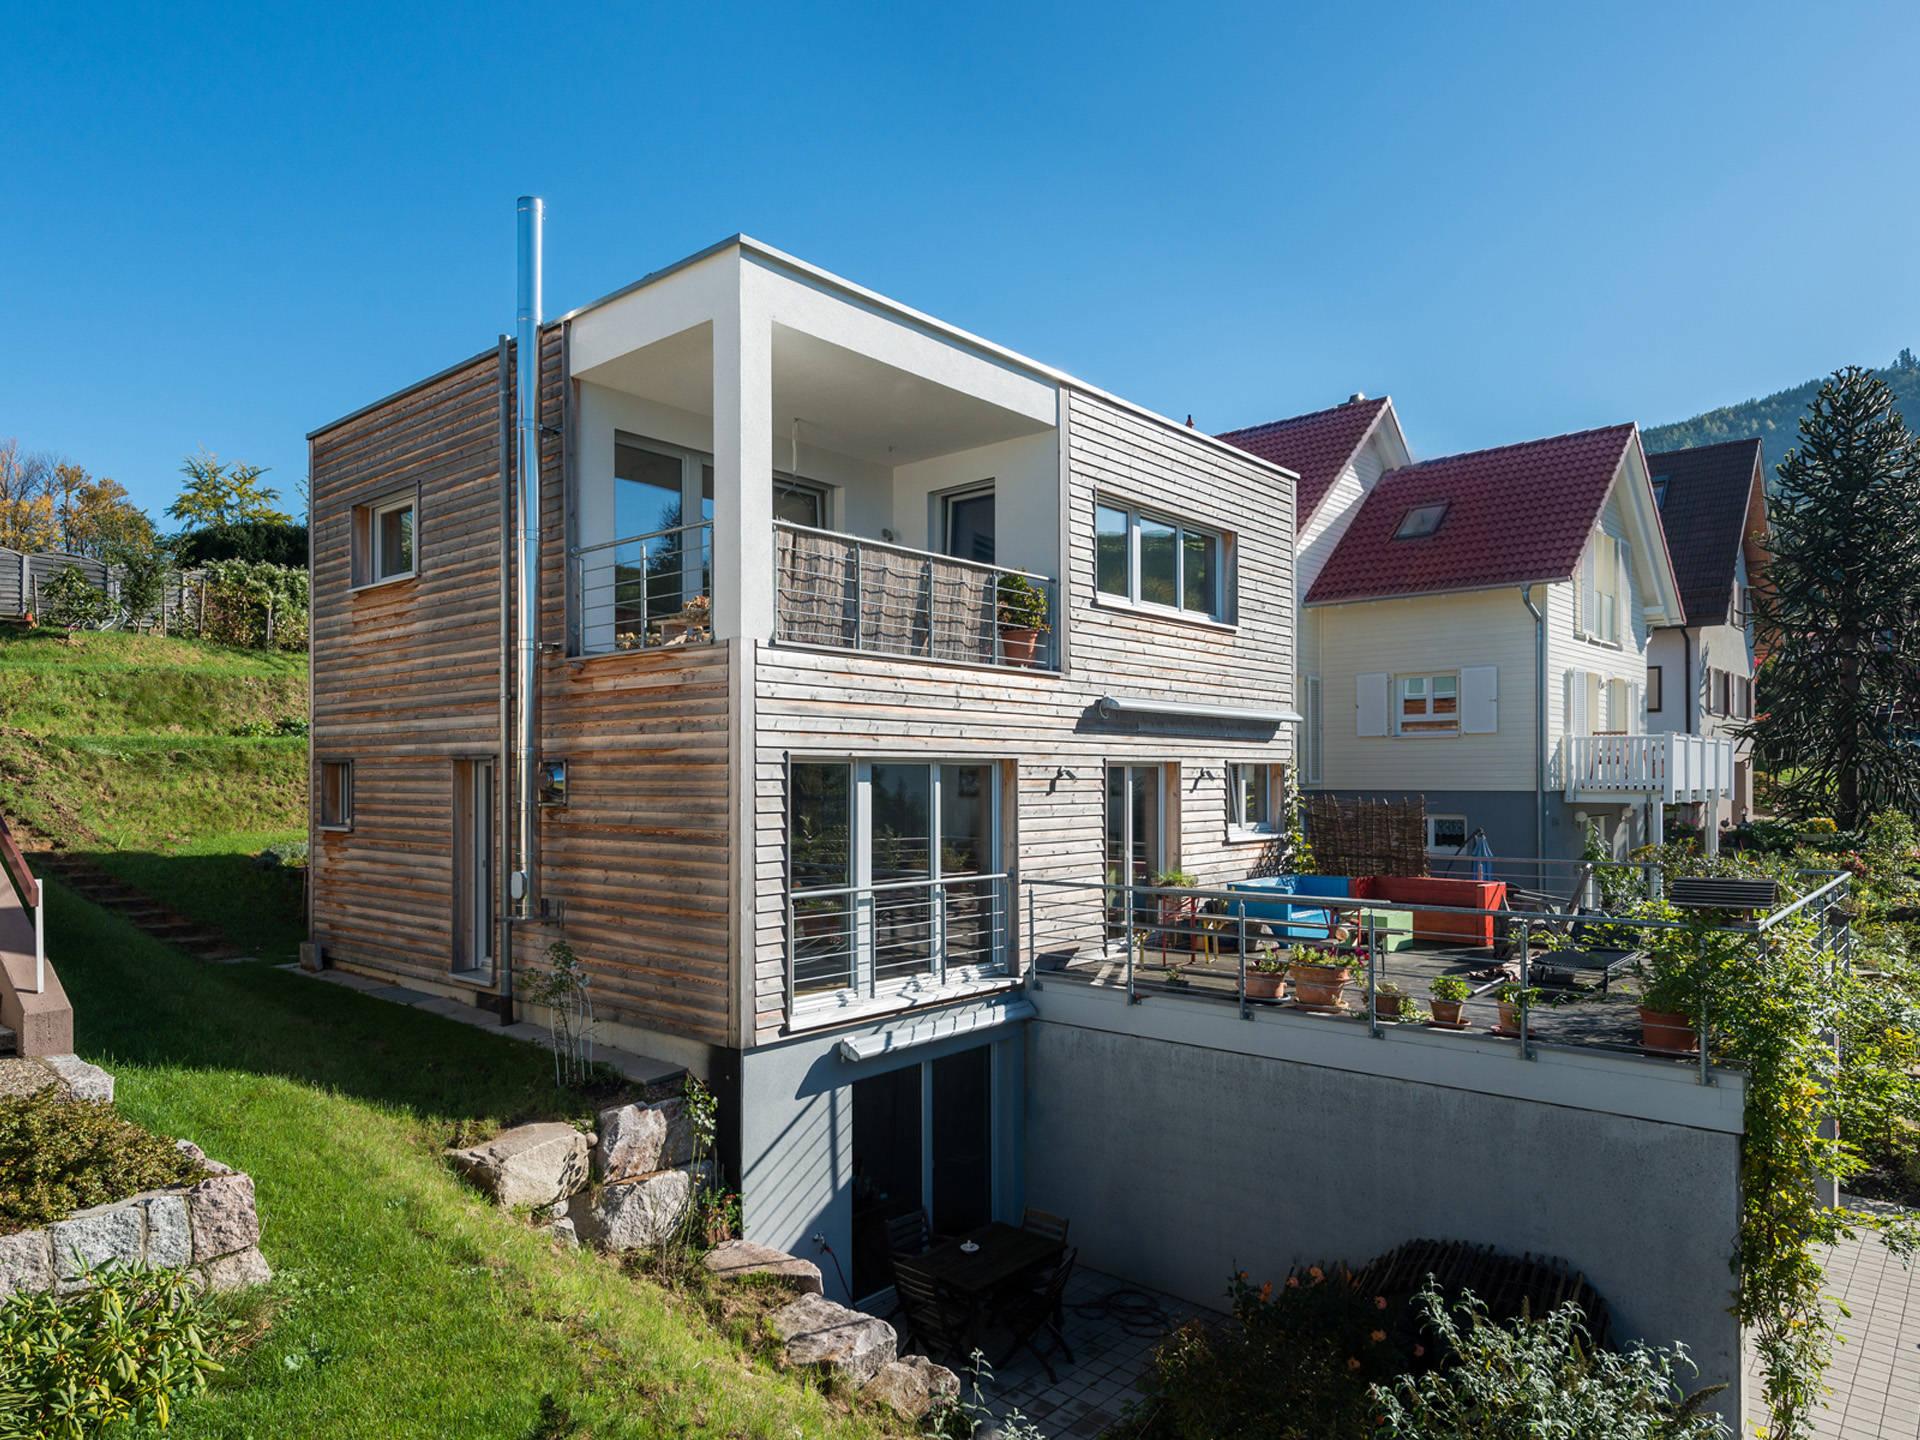 Haus Design 120 - Frammelsberger R. Ingenieur - Holzhaus ...